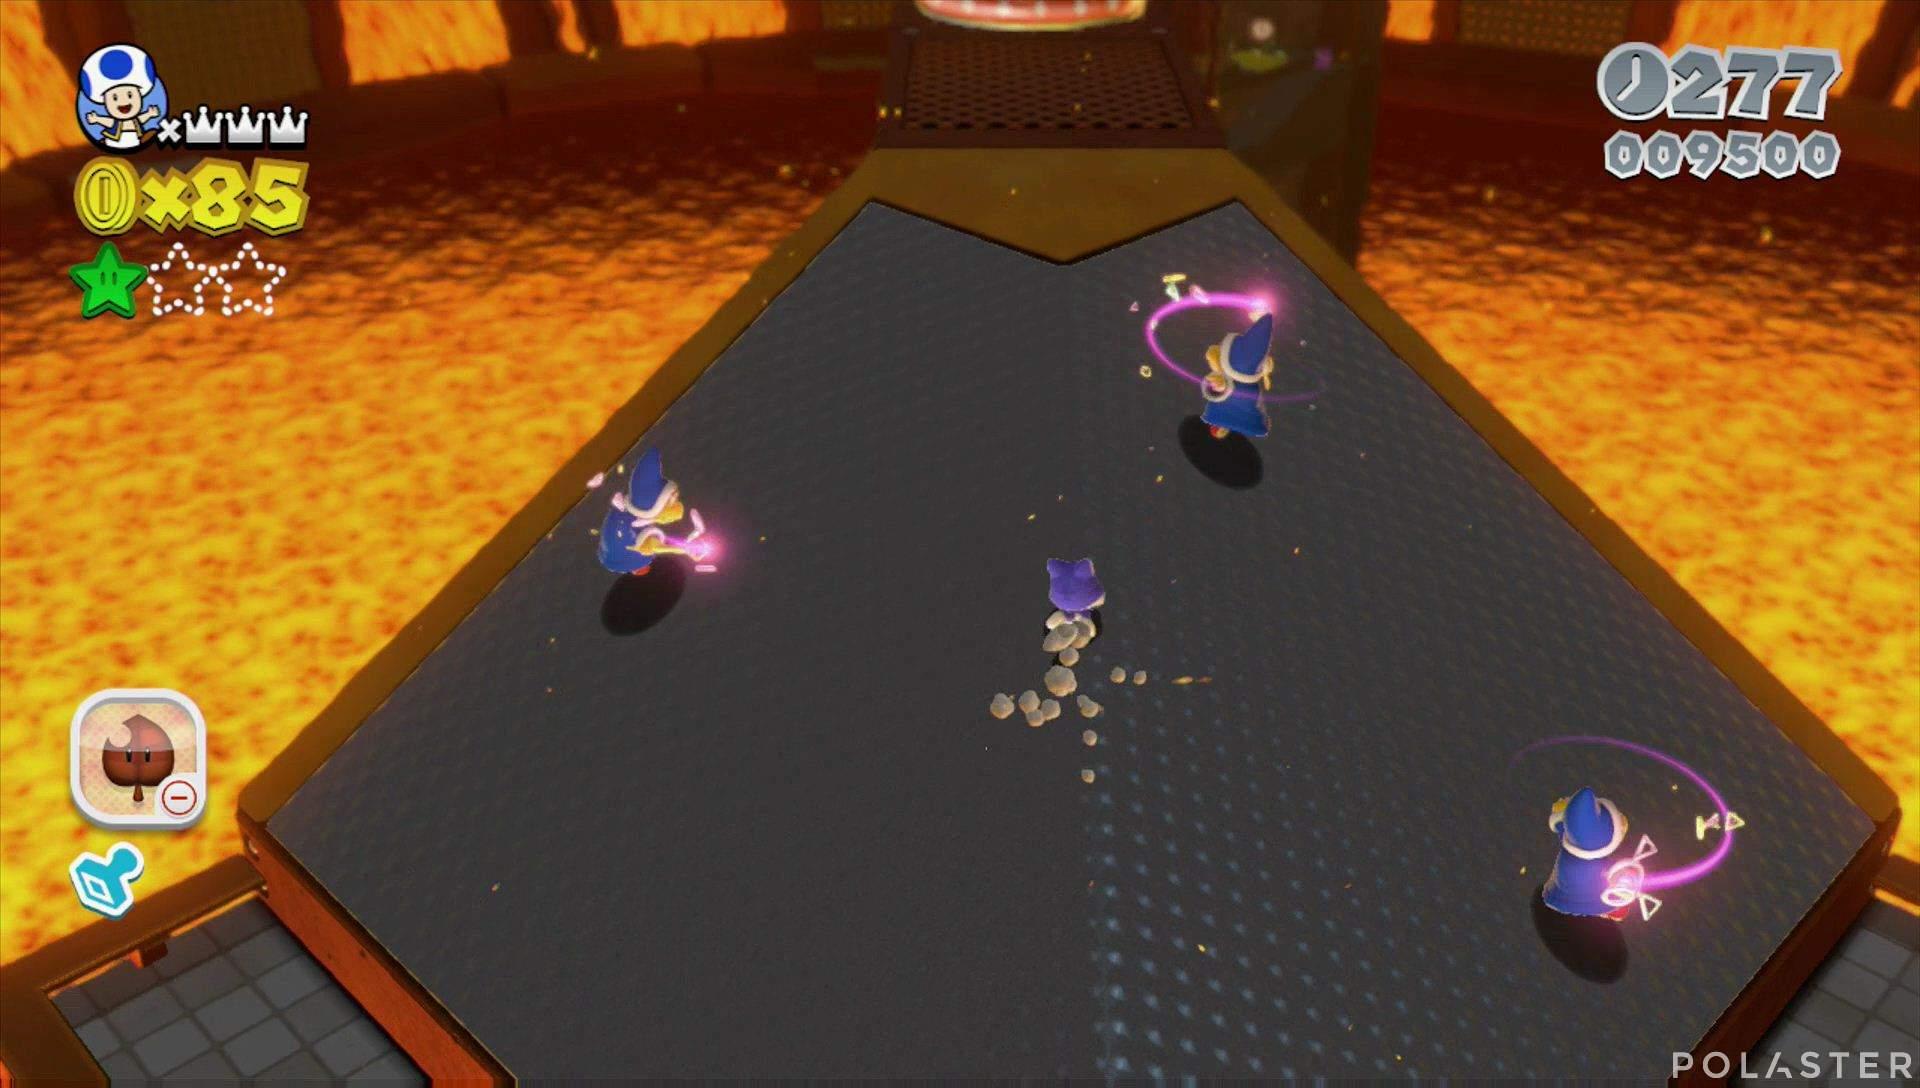 Super Mario 3D World Mundo Castillo-5 Estrella 2